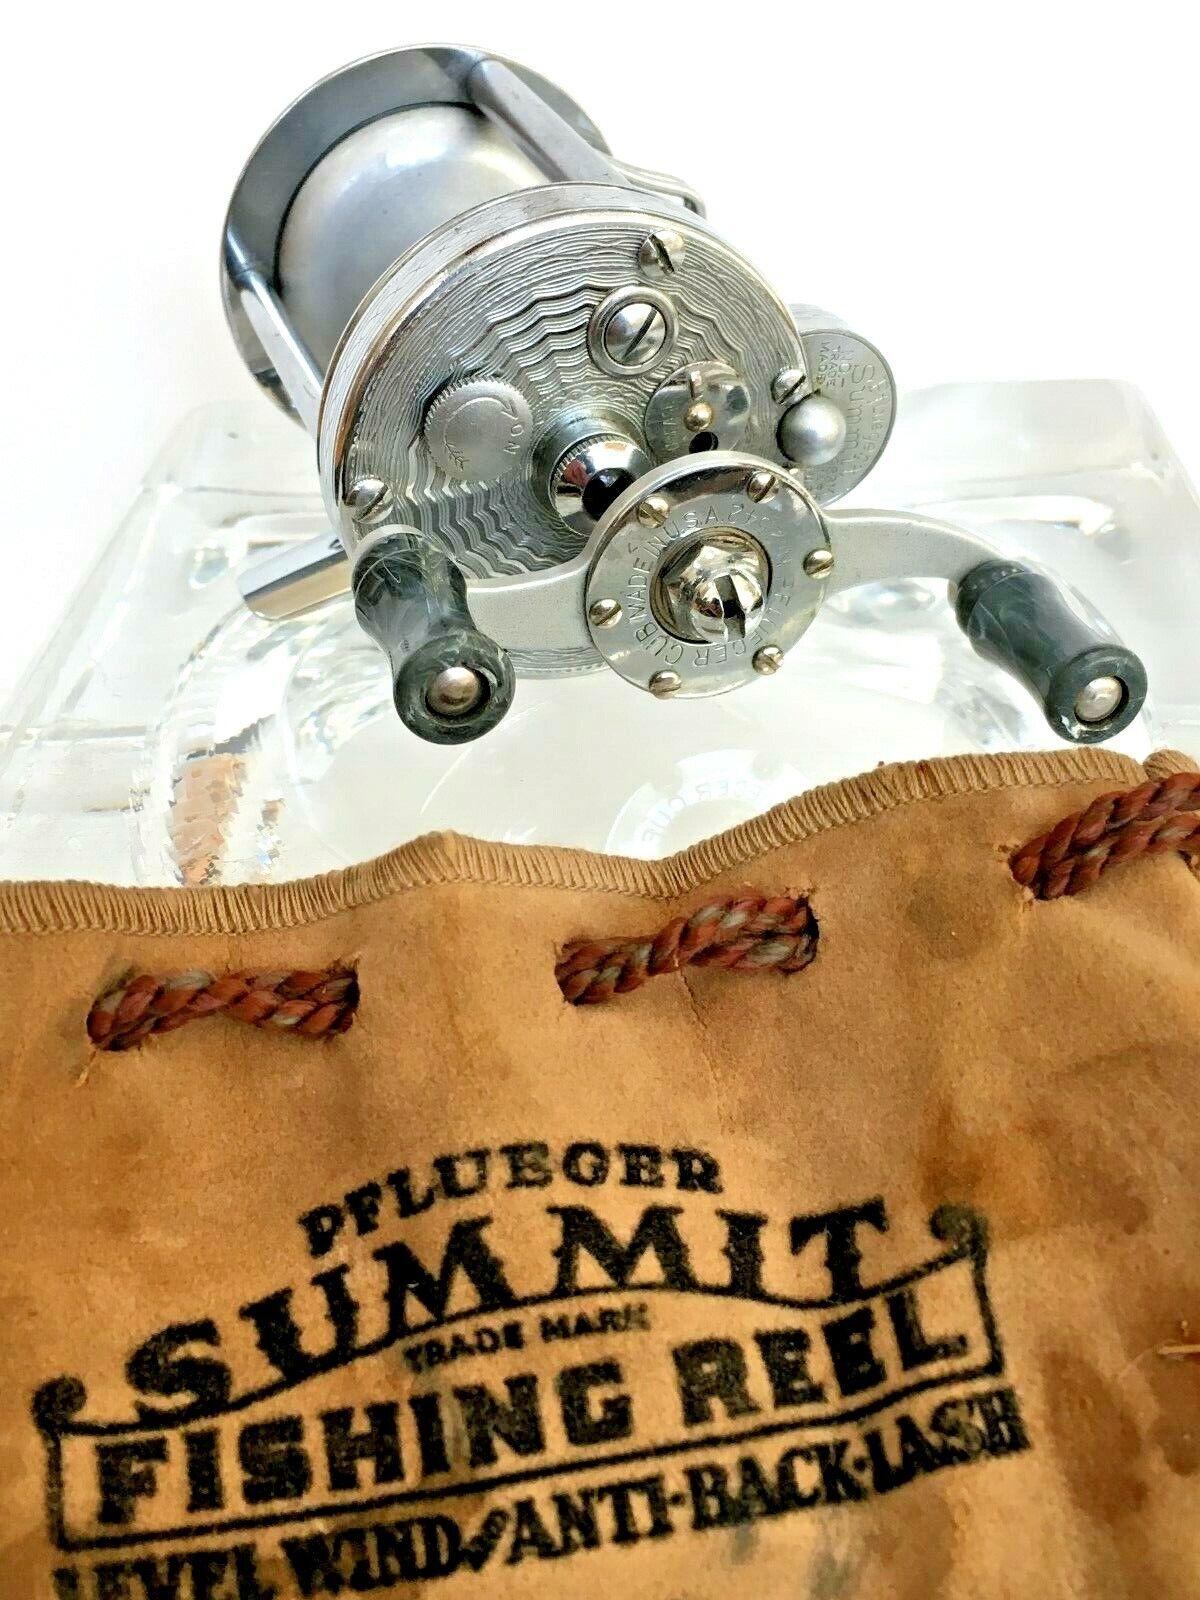 Engraved Pflueger Summit 1983-M, Jeweled, Bait Casting Fishing Reel, USA